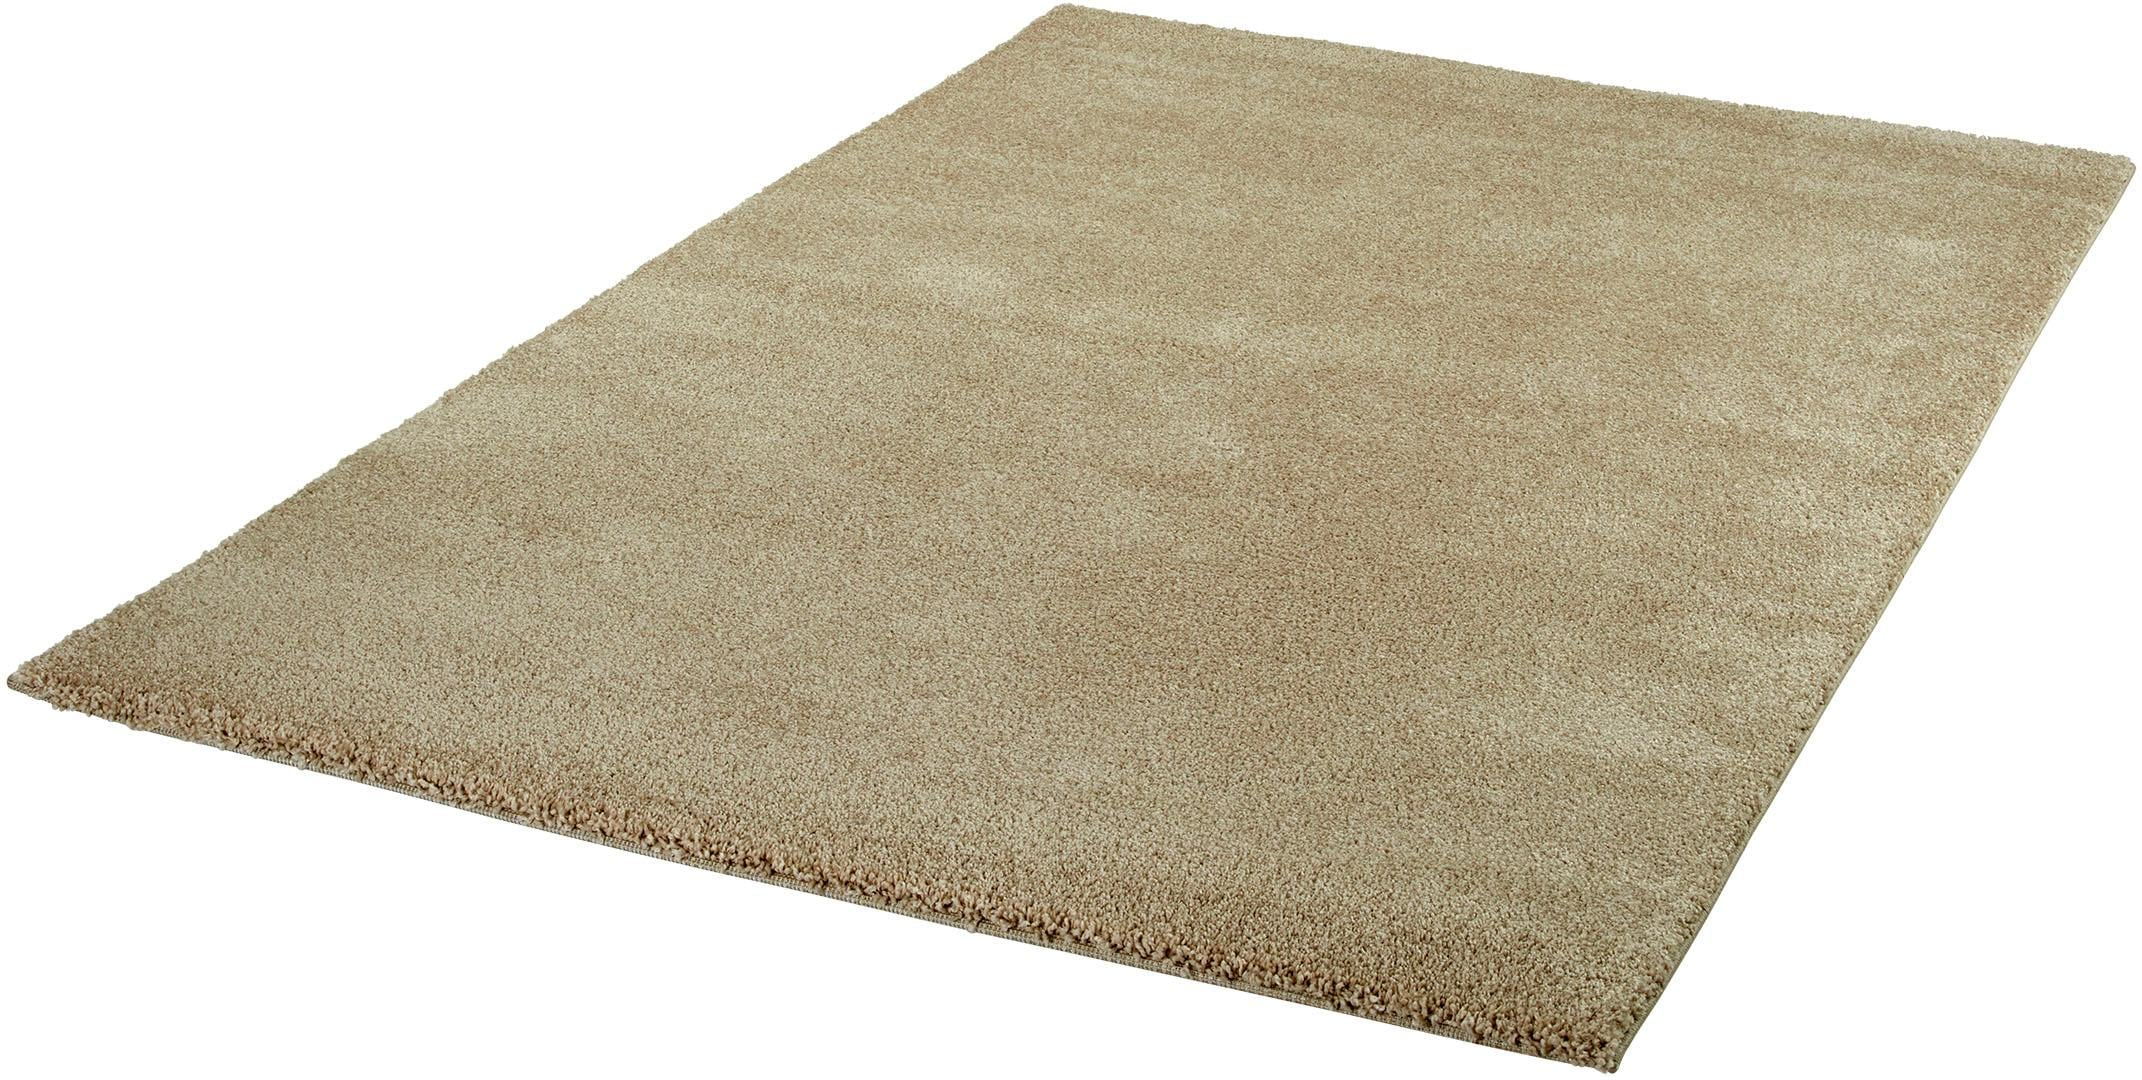 Hochflor-Teppich My Soho 840 Obsession rechteckig Höhe 25 mm maschinell gewebt